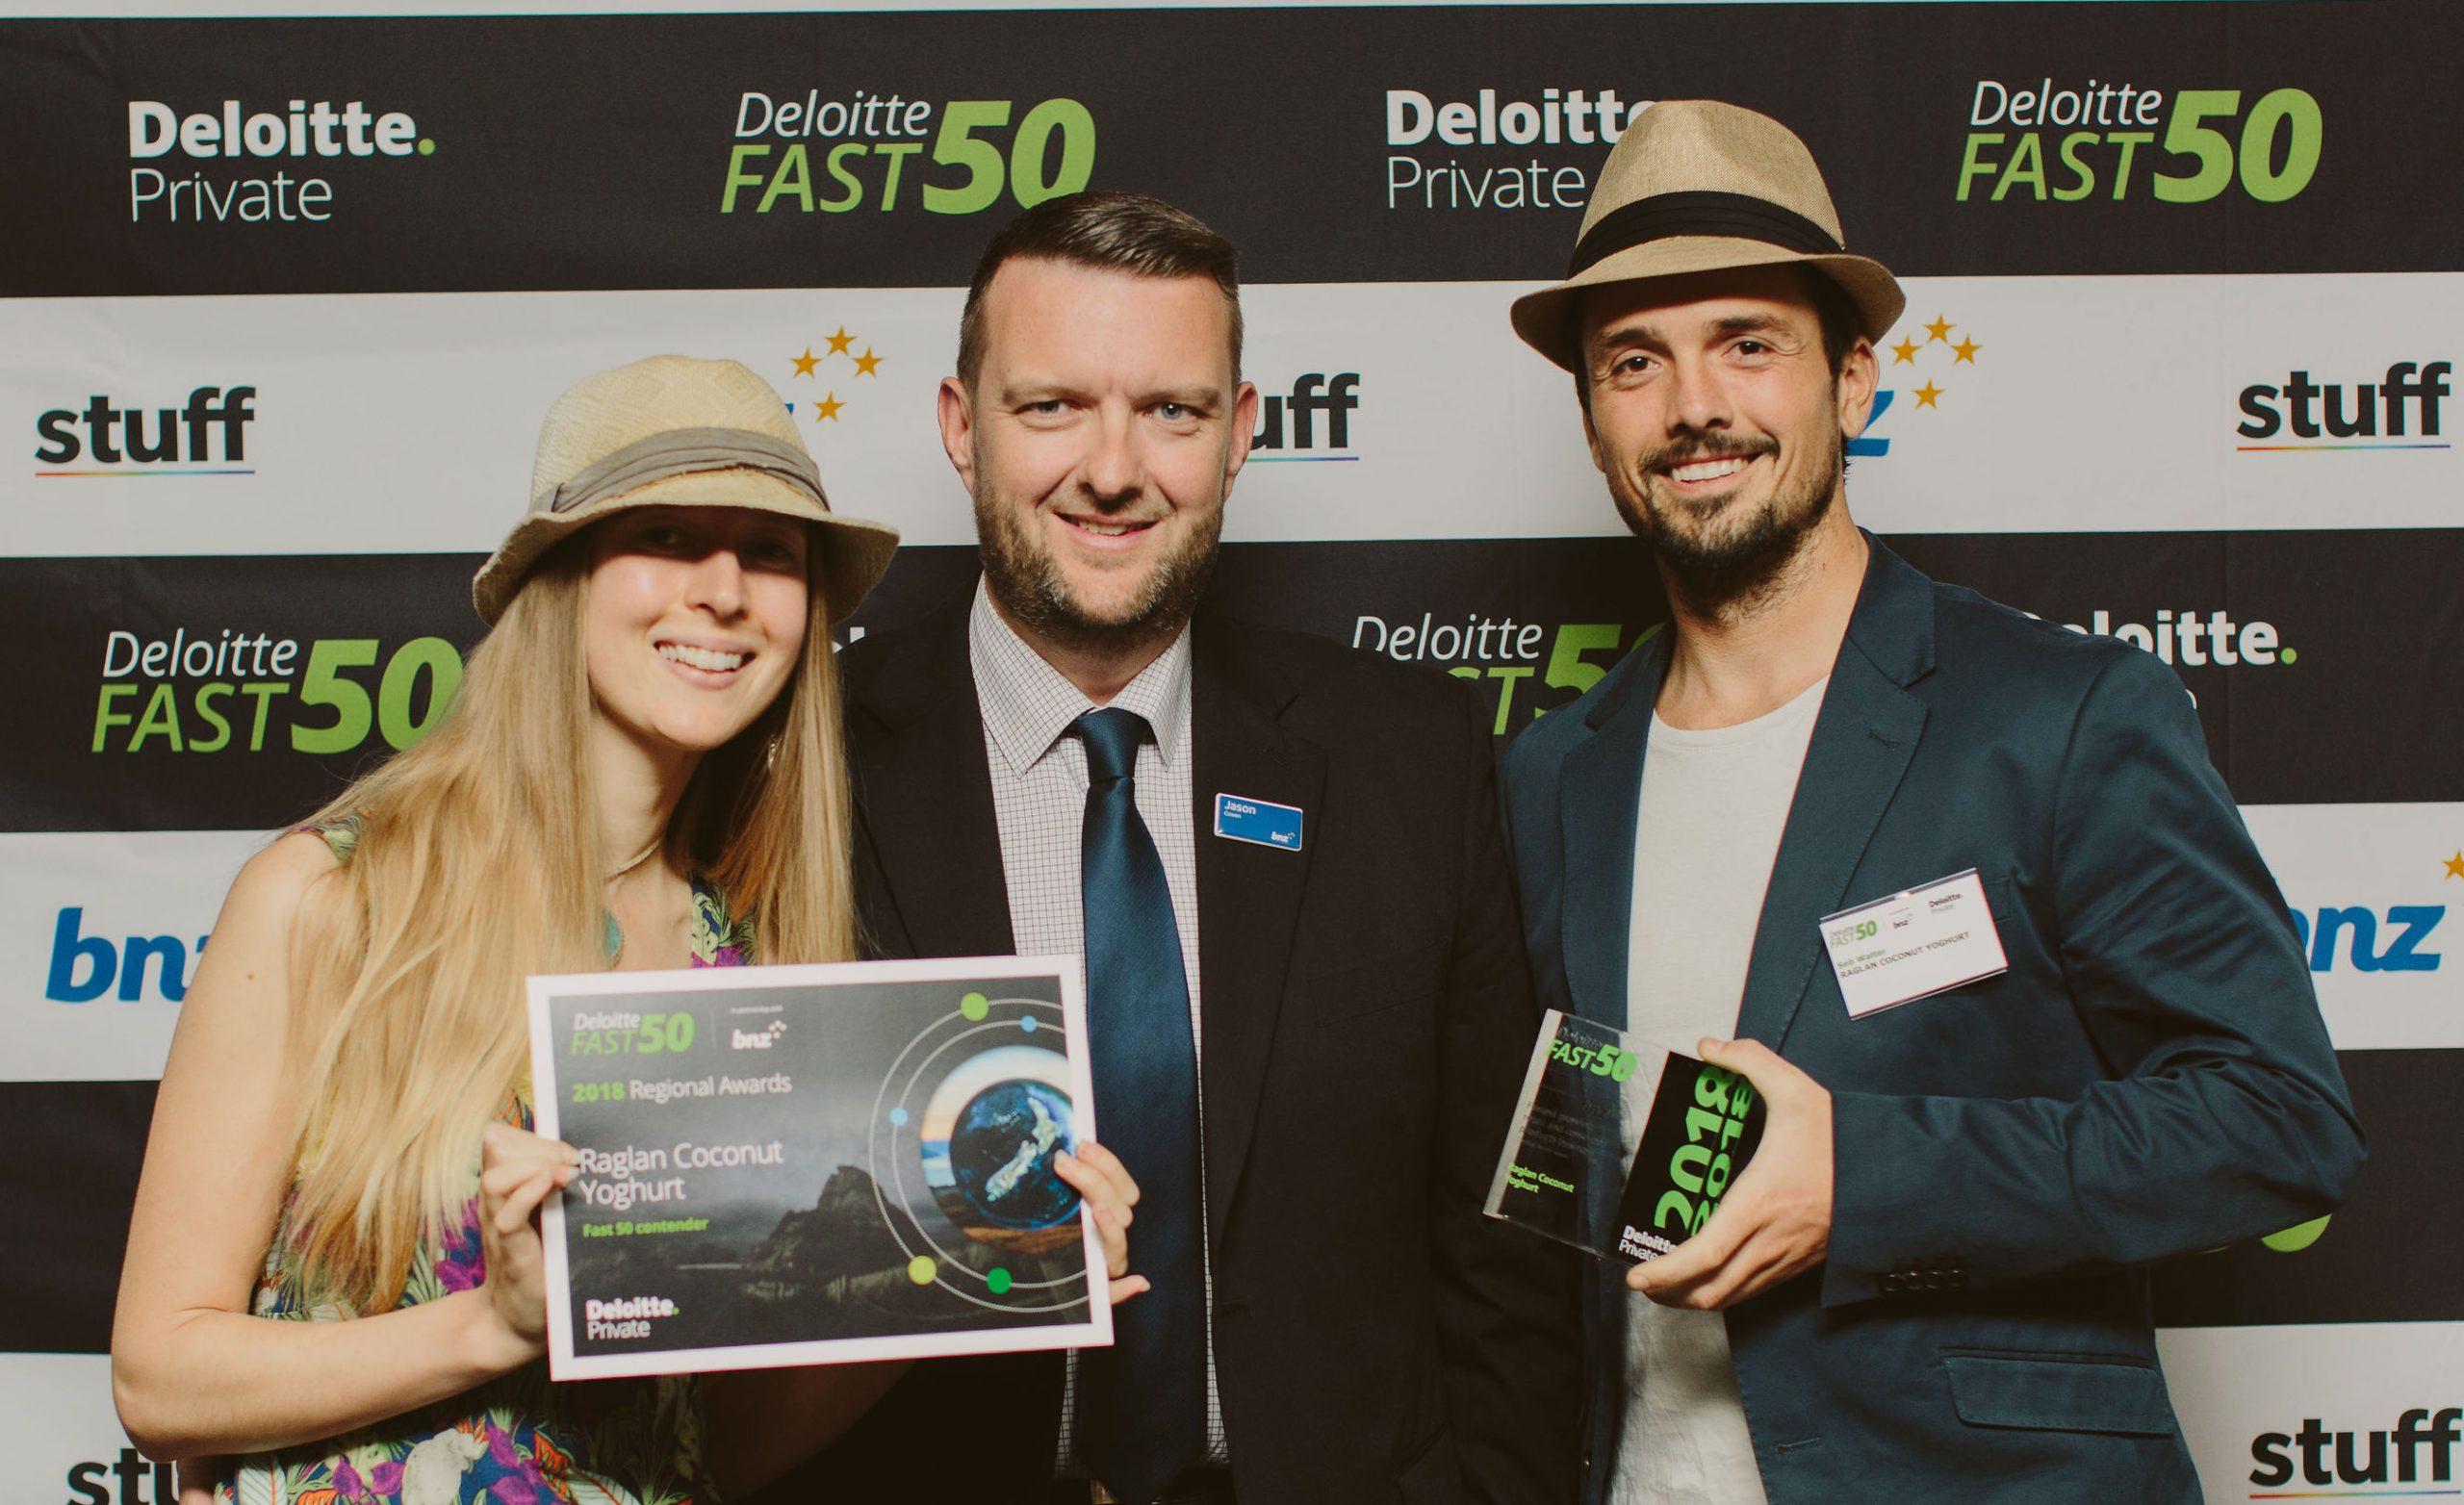 The Raglan Coconut Yoghurt team holds their Fast50 award